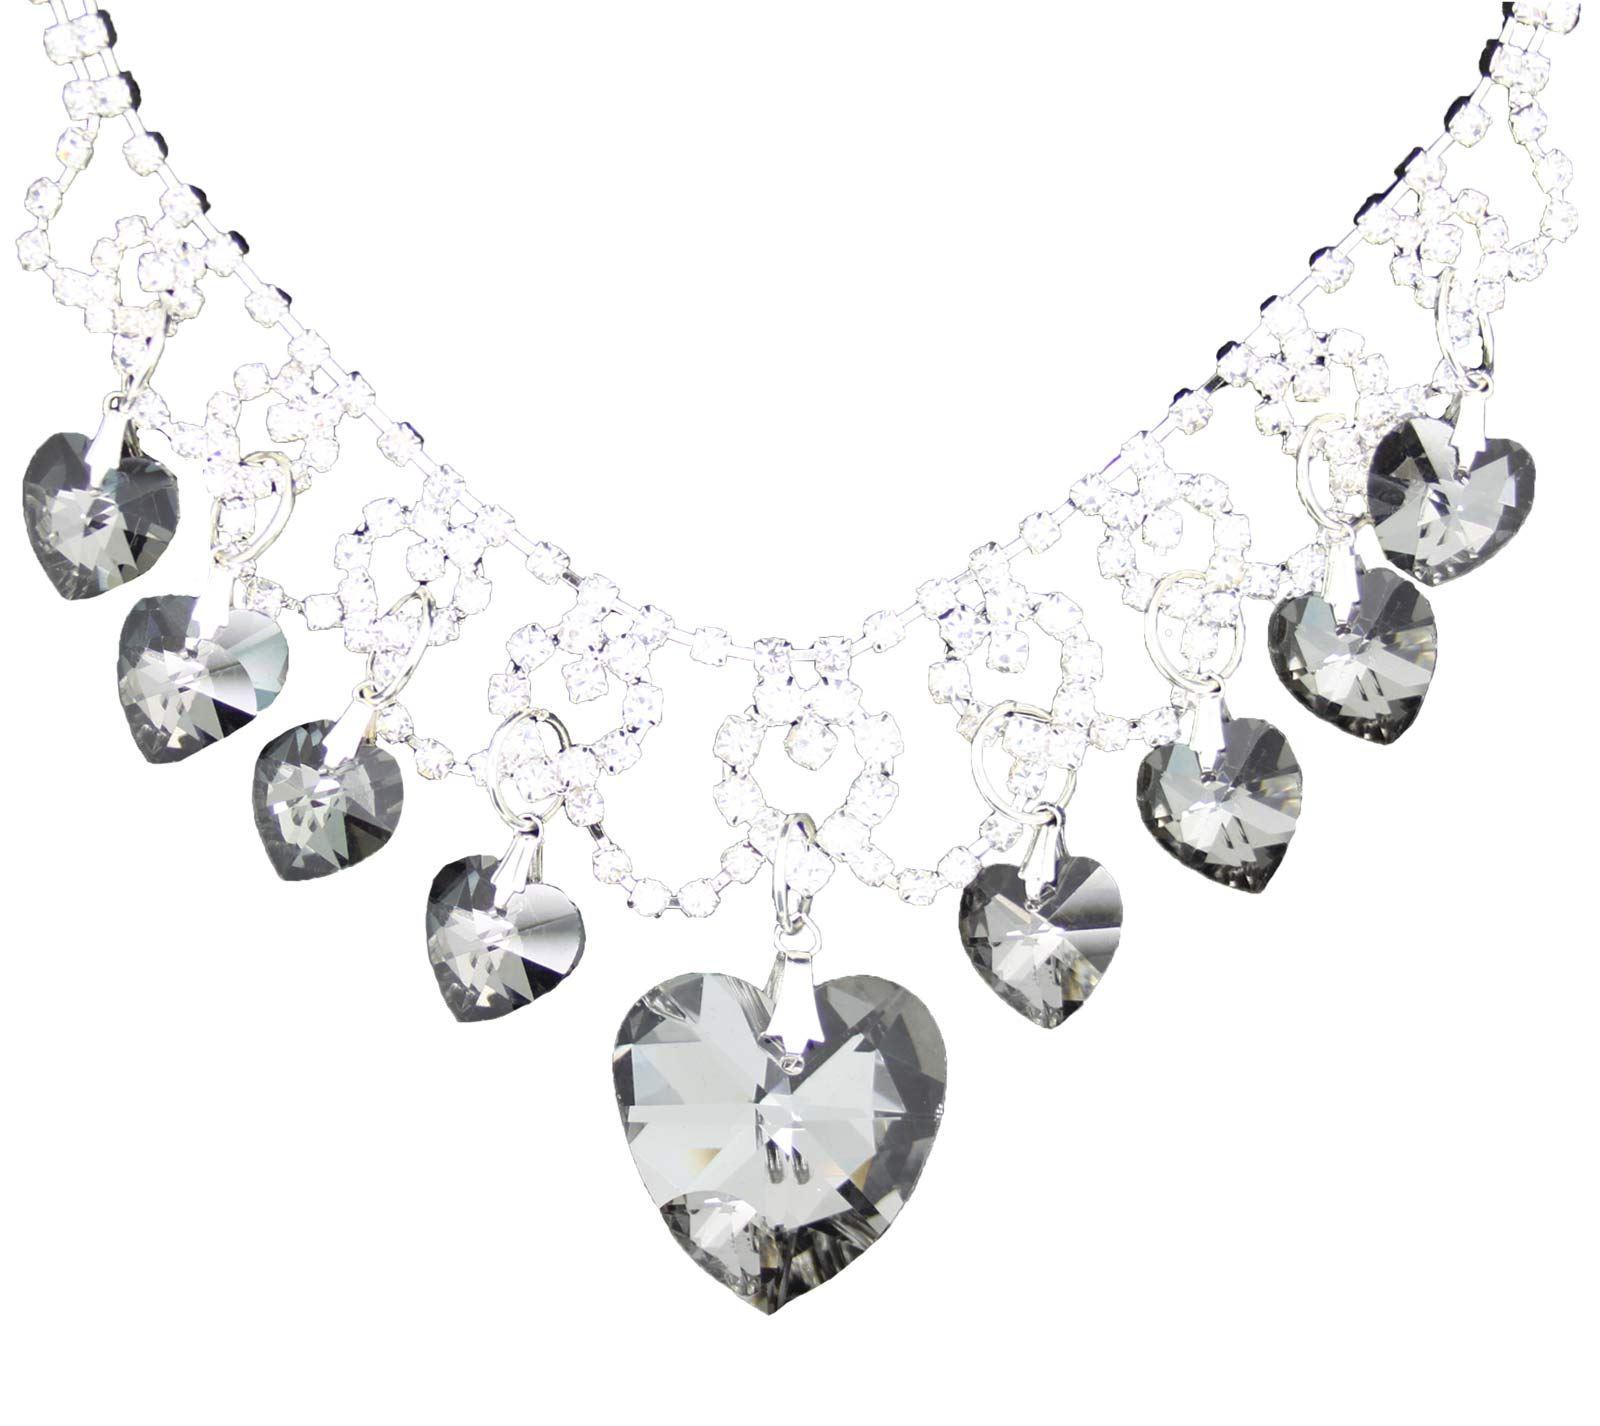 True-Face-Ladies-Women-039-s-Elegant-Earrings-Necklace-Set-Metal-Alloy-Jewellery thumbnail 22